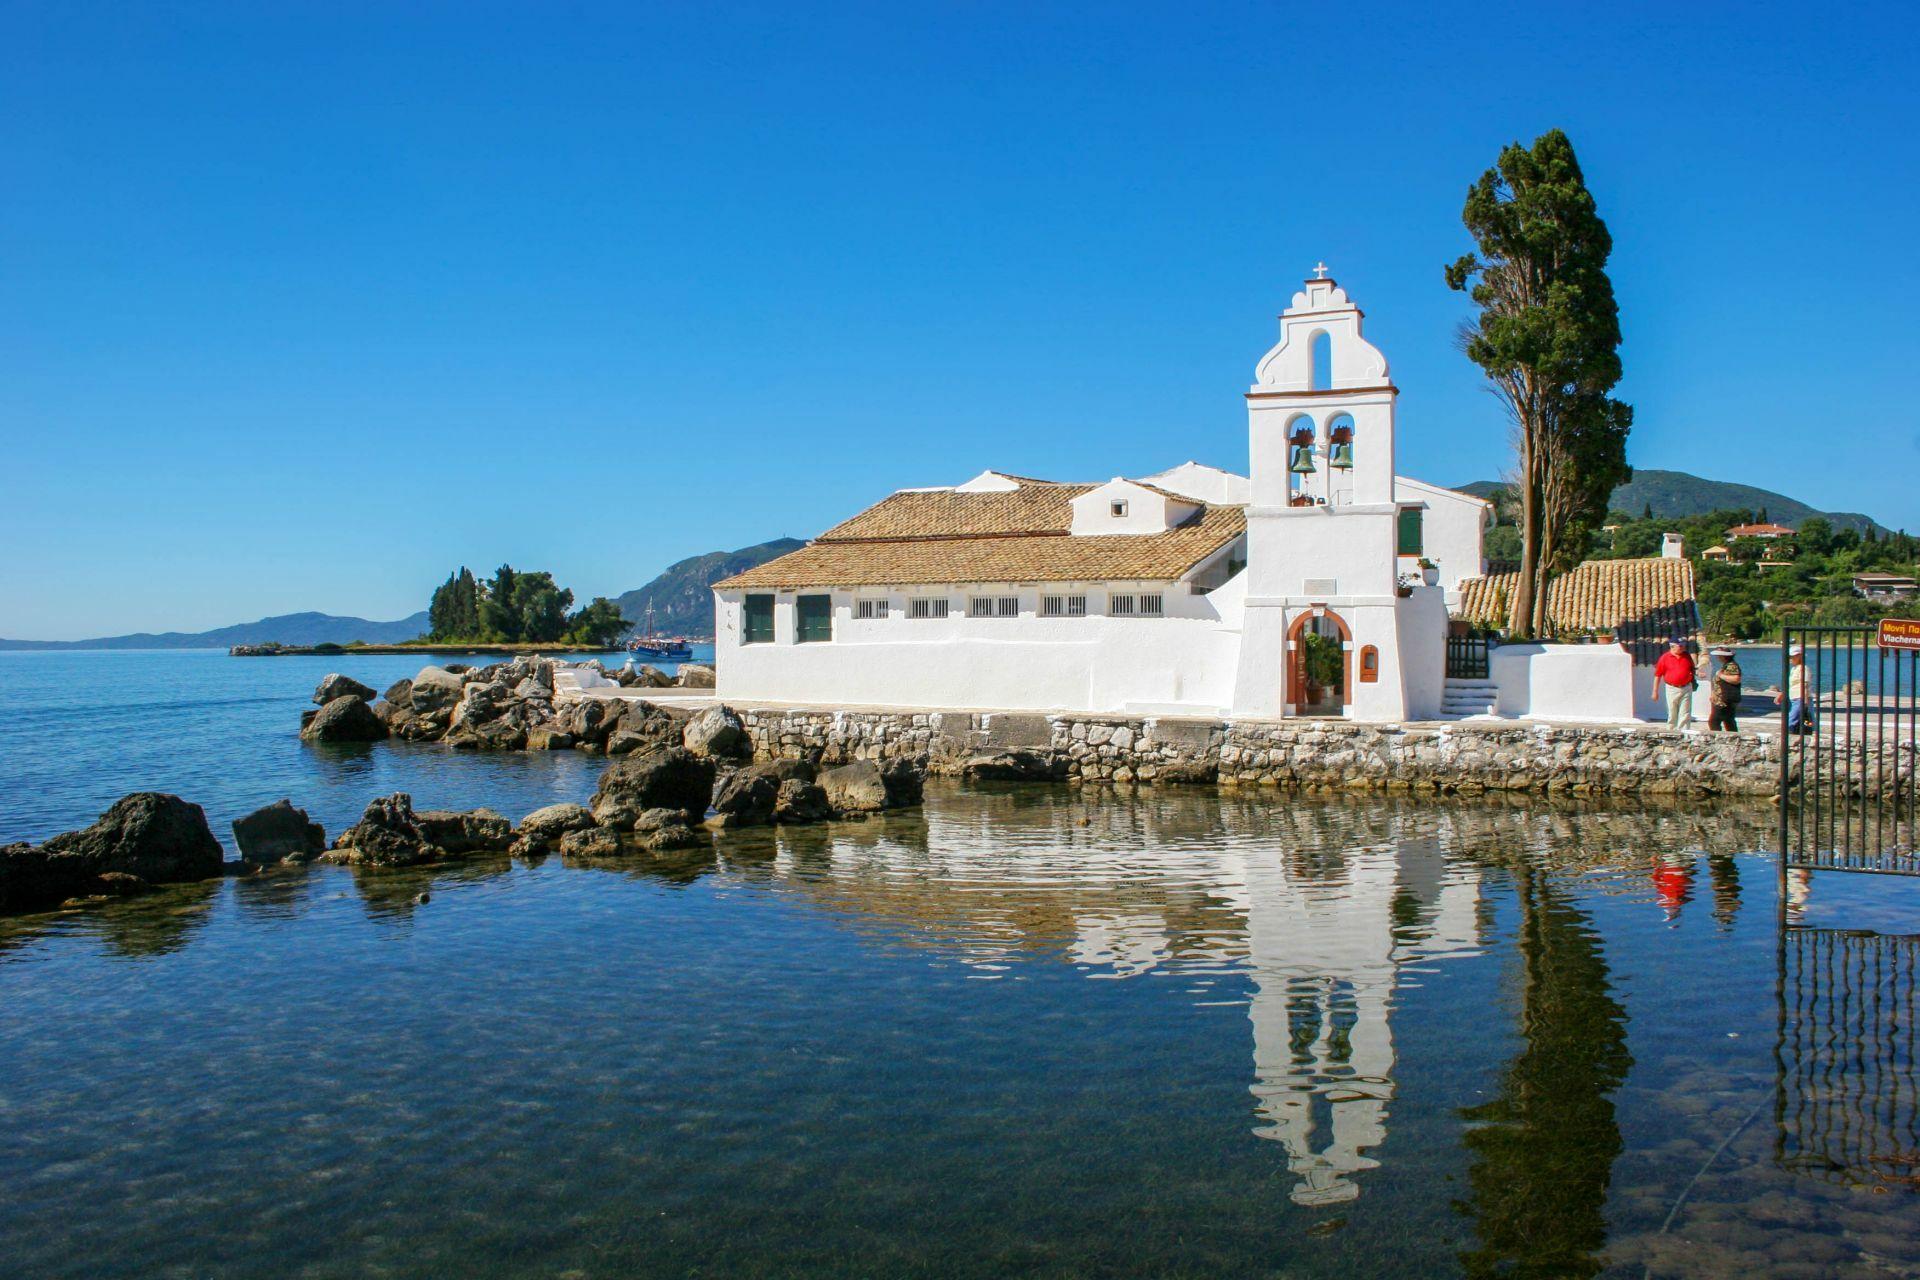 Corfu island: Mouse Island